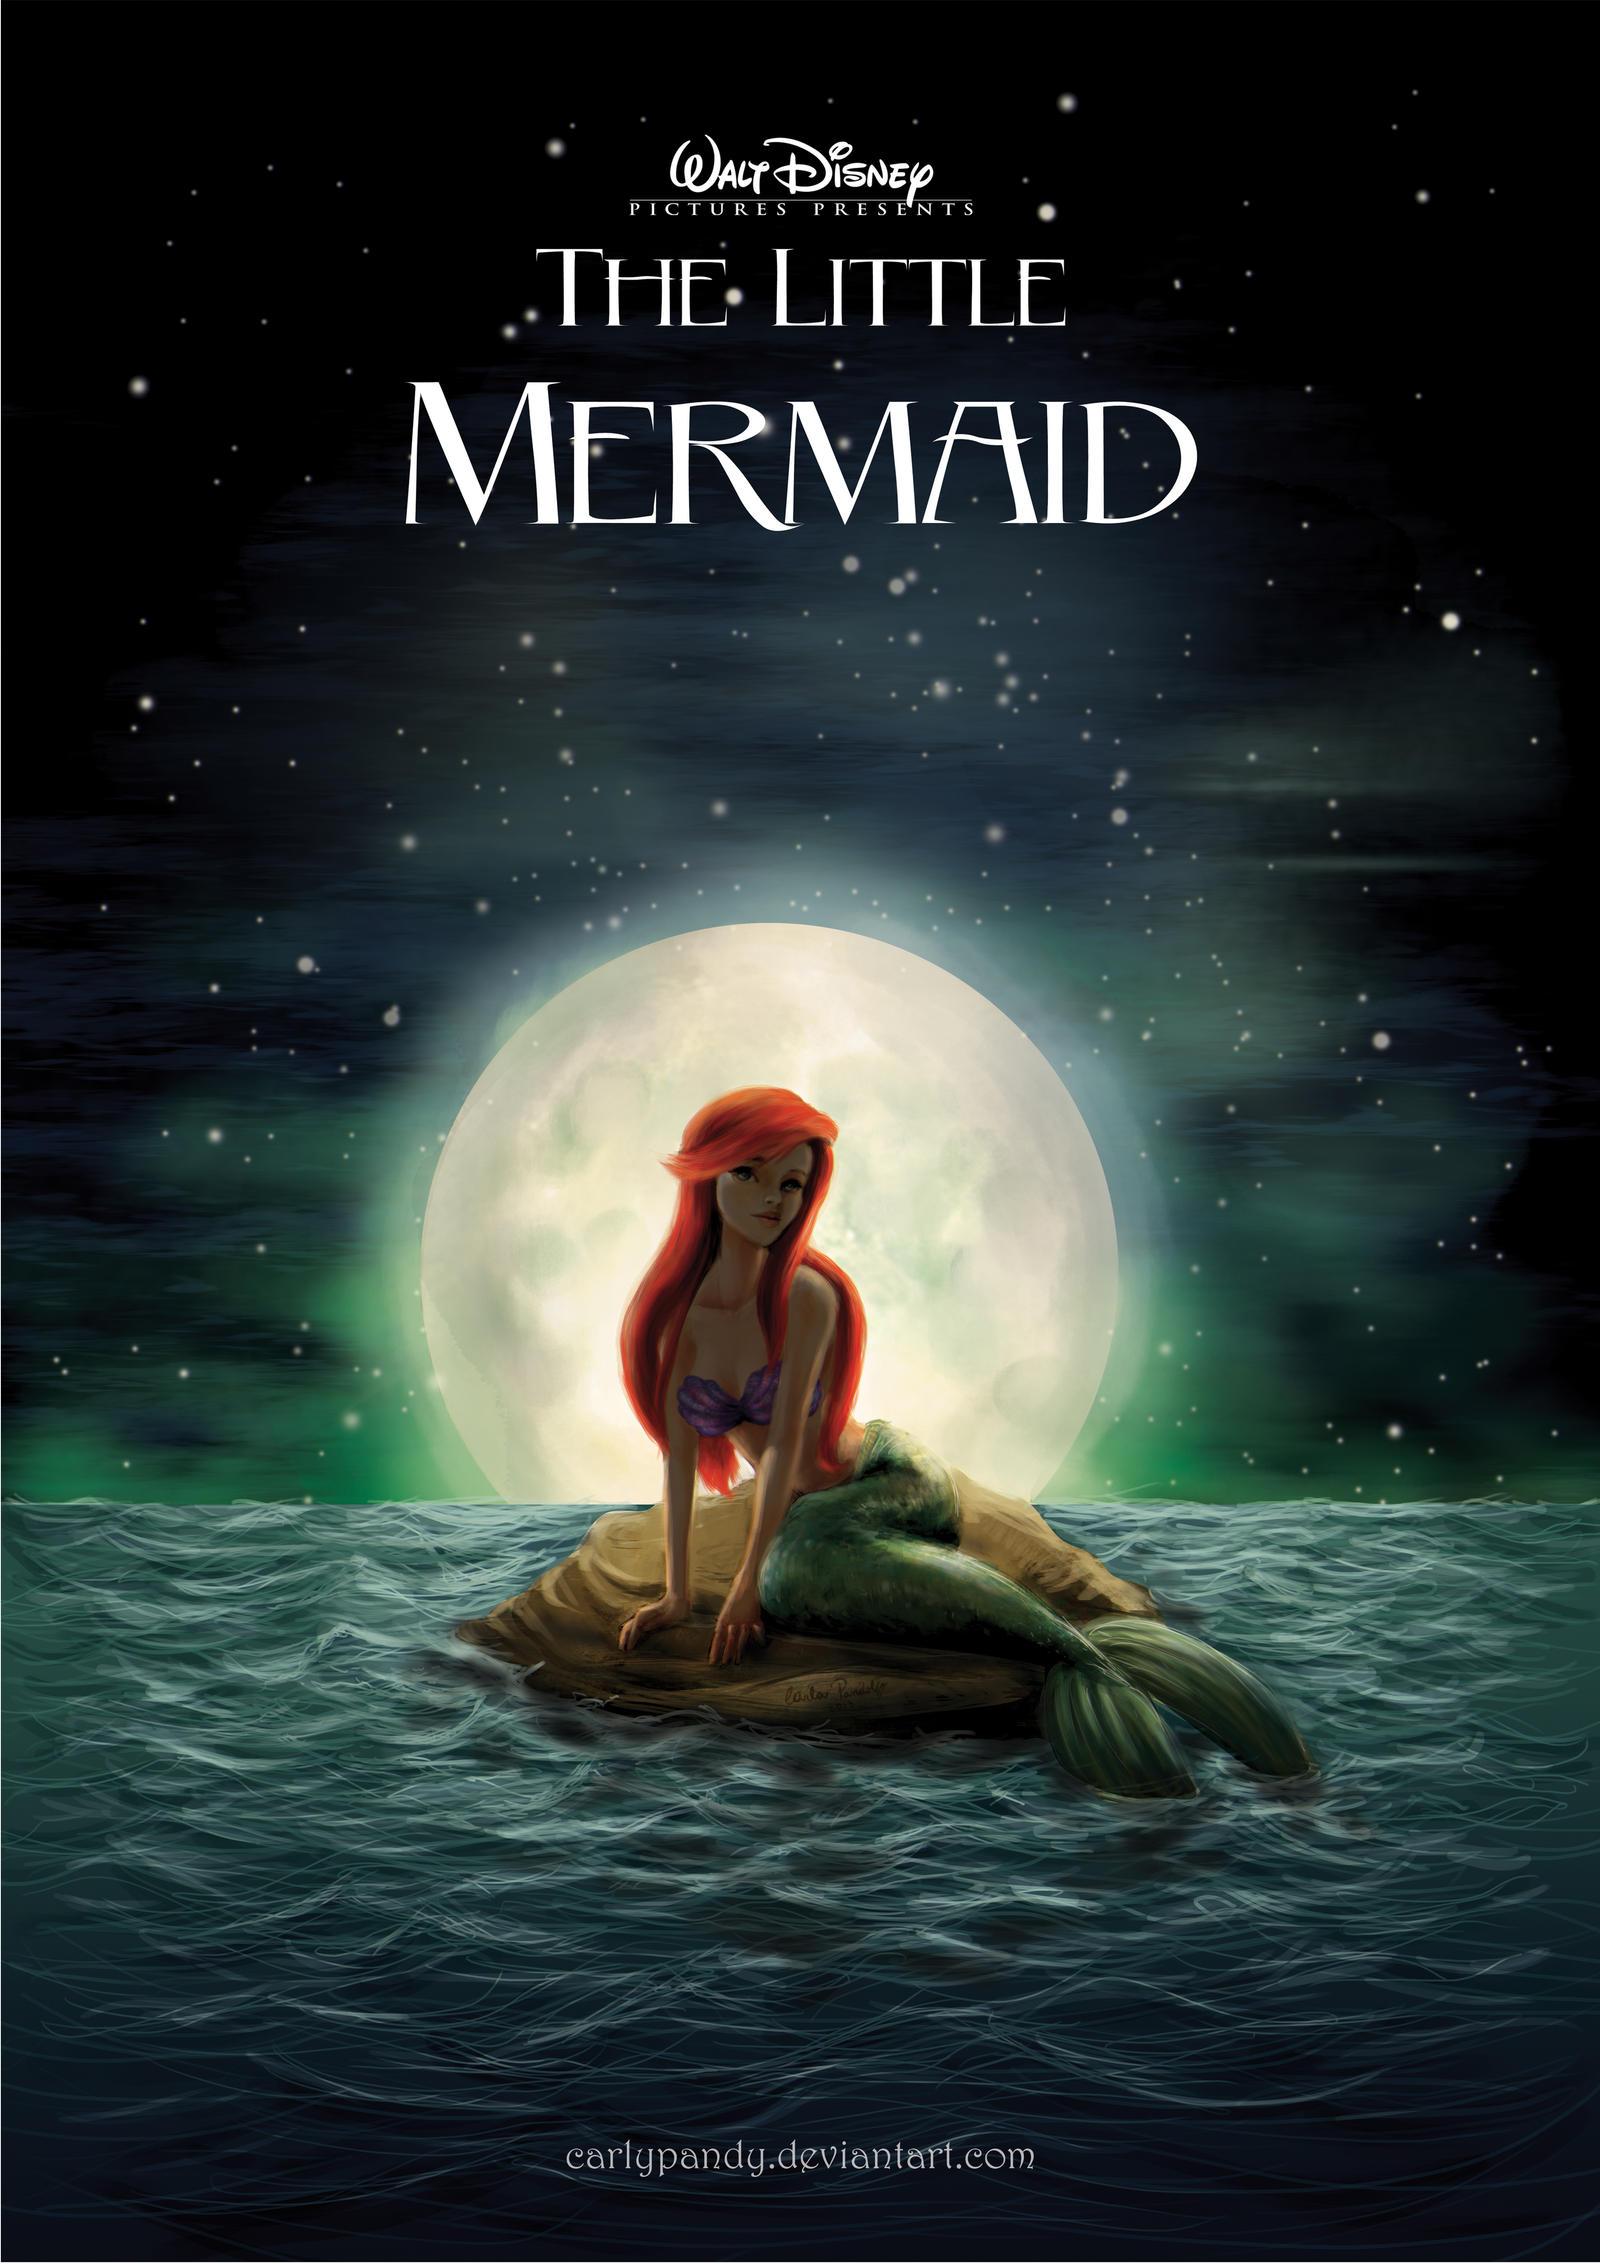 -The Little Mermaid - by CarlyPandy on DeviantArt